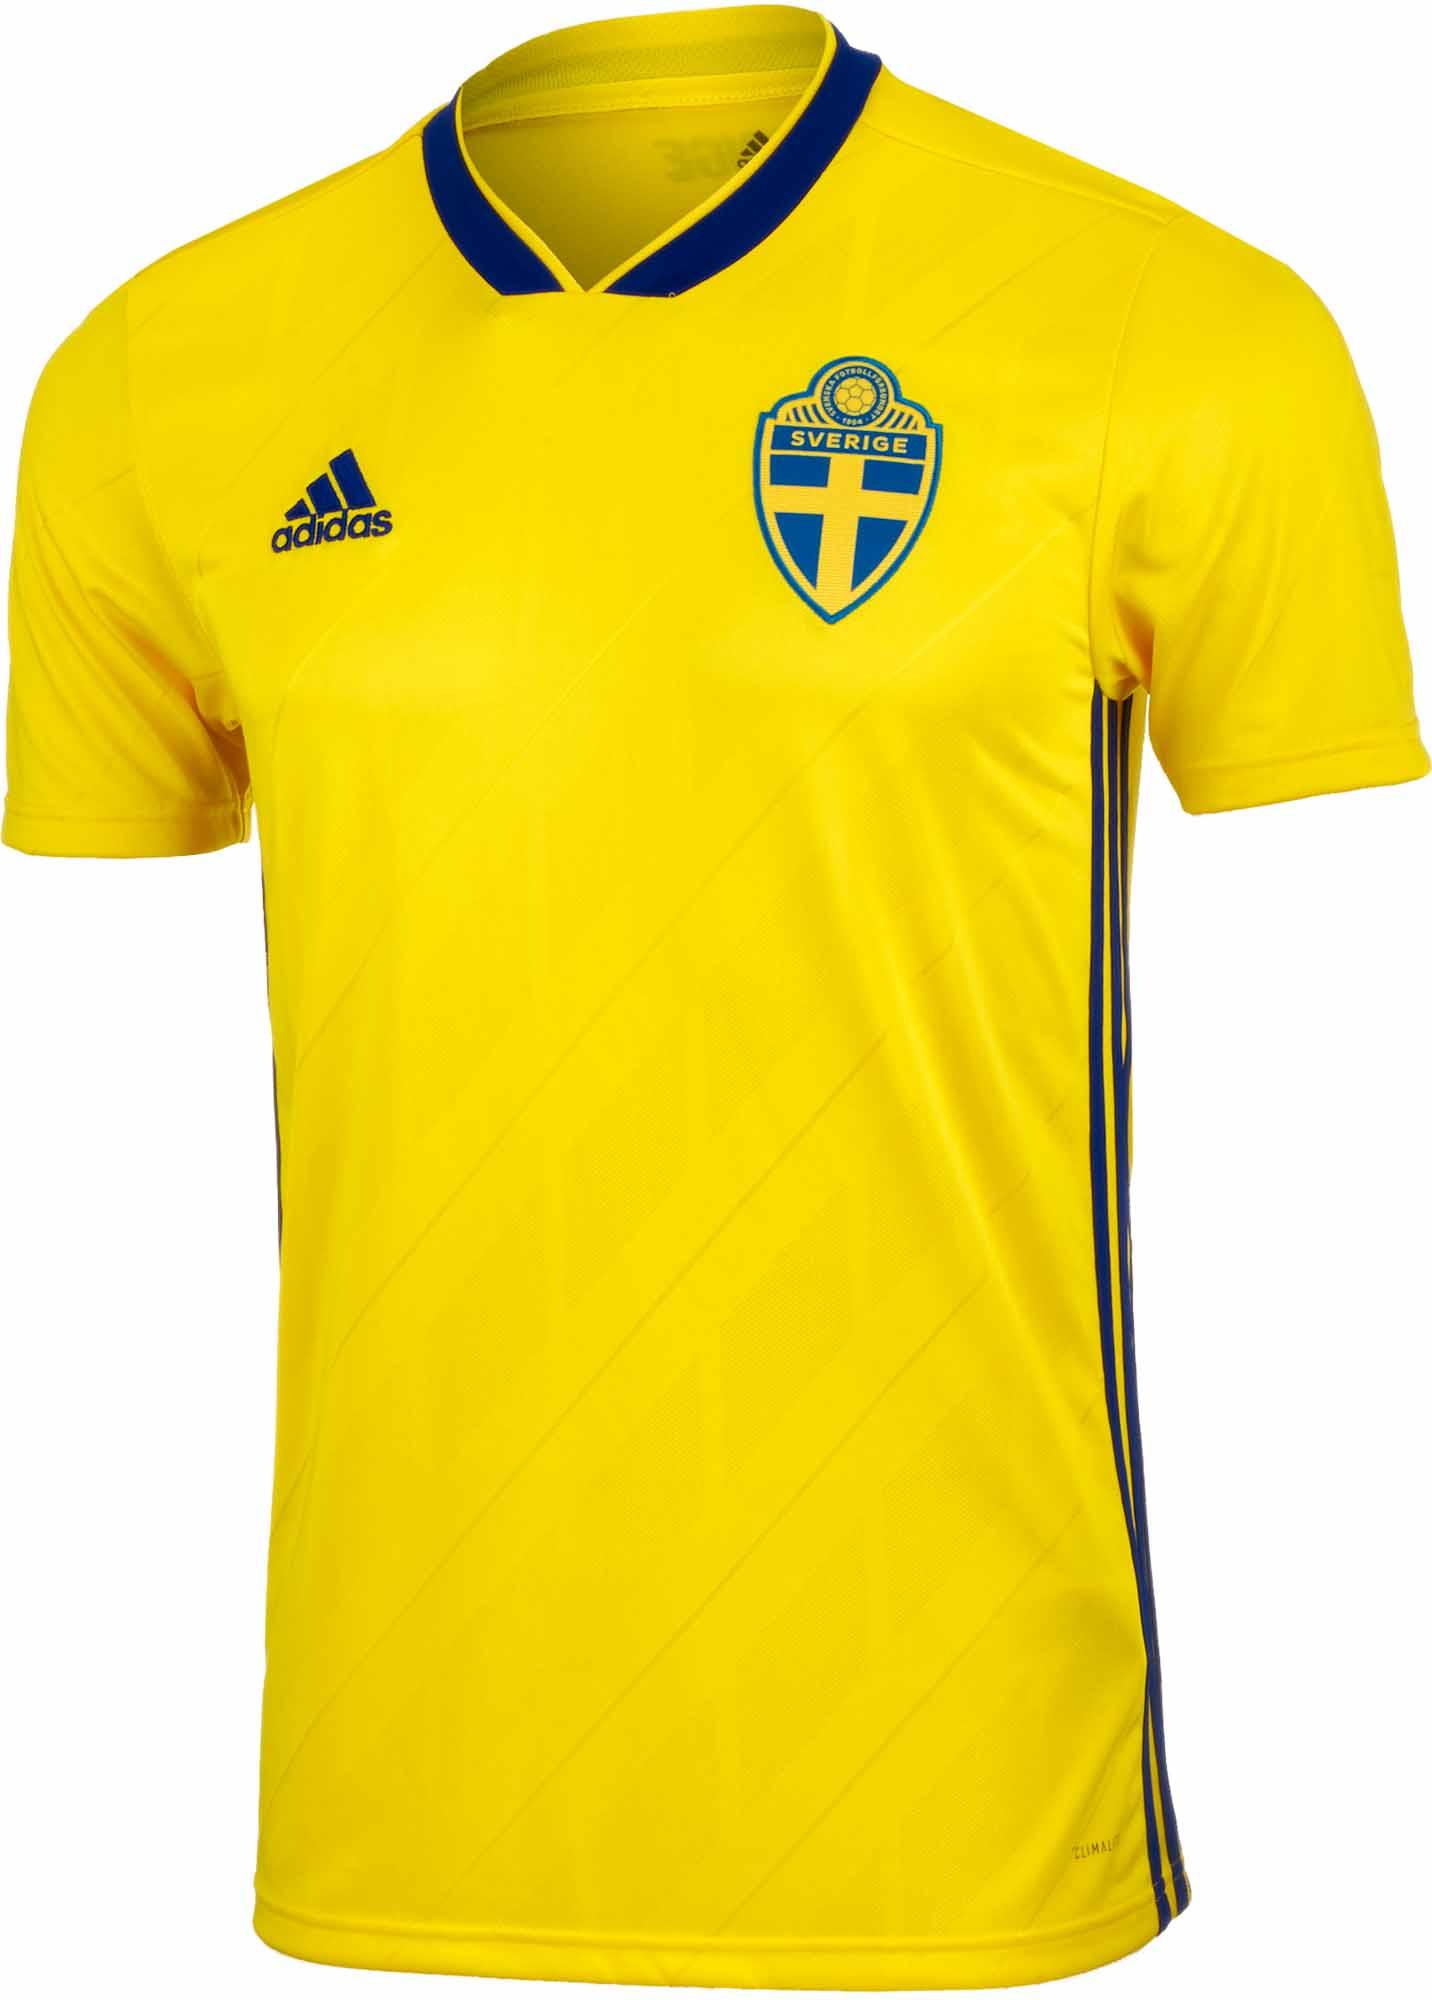 adidas Sweden Home Jersey 2018-19 - SoccerPro